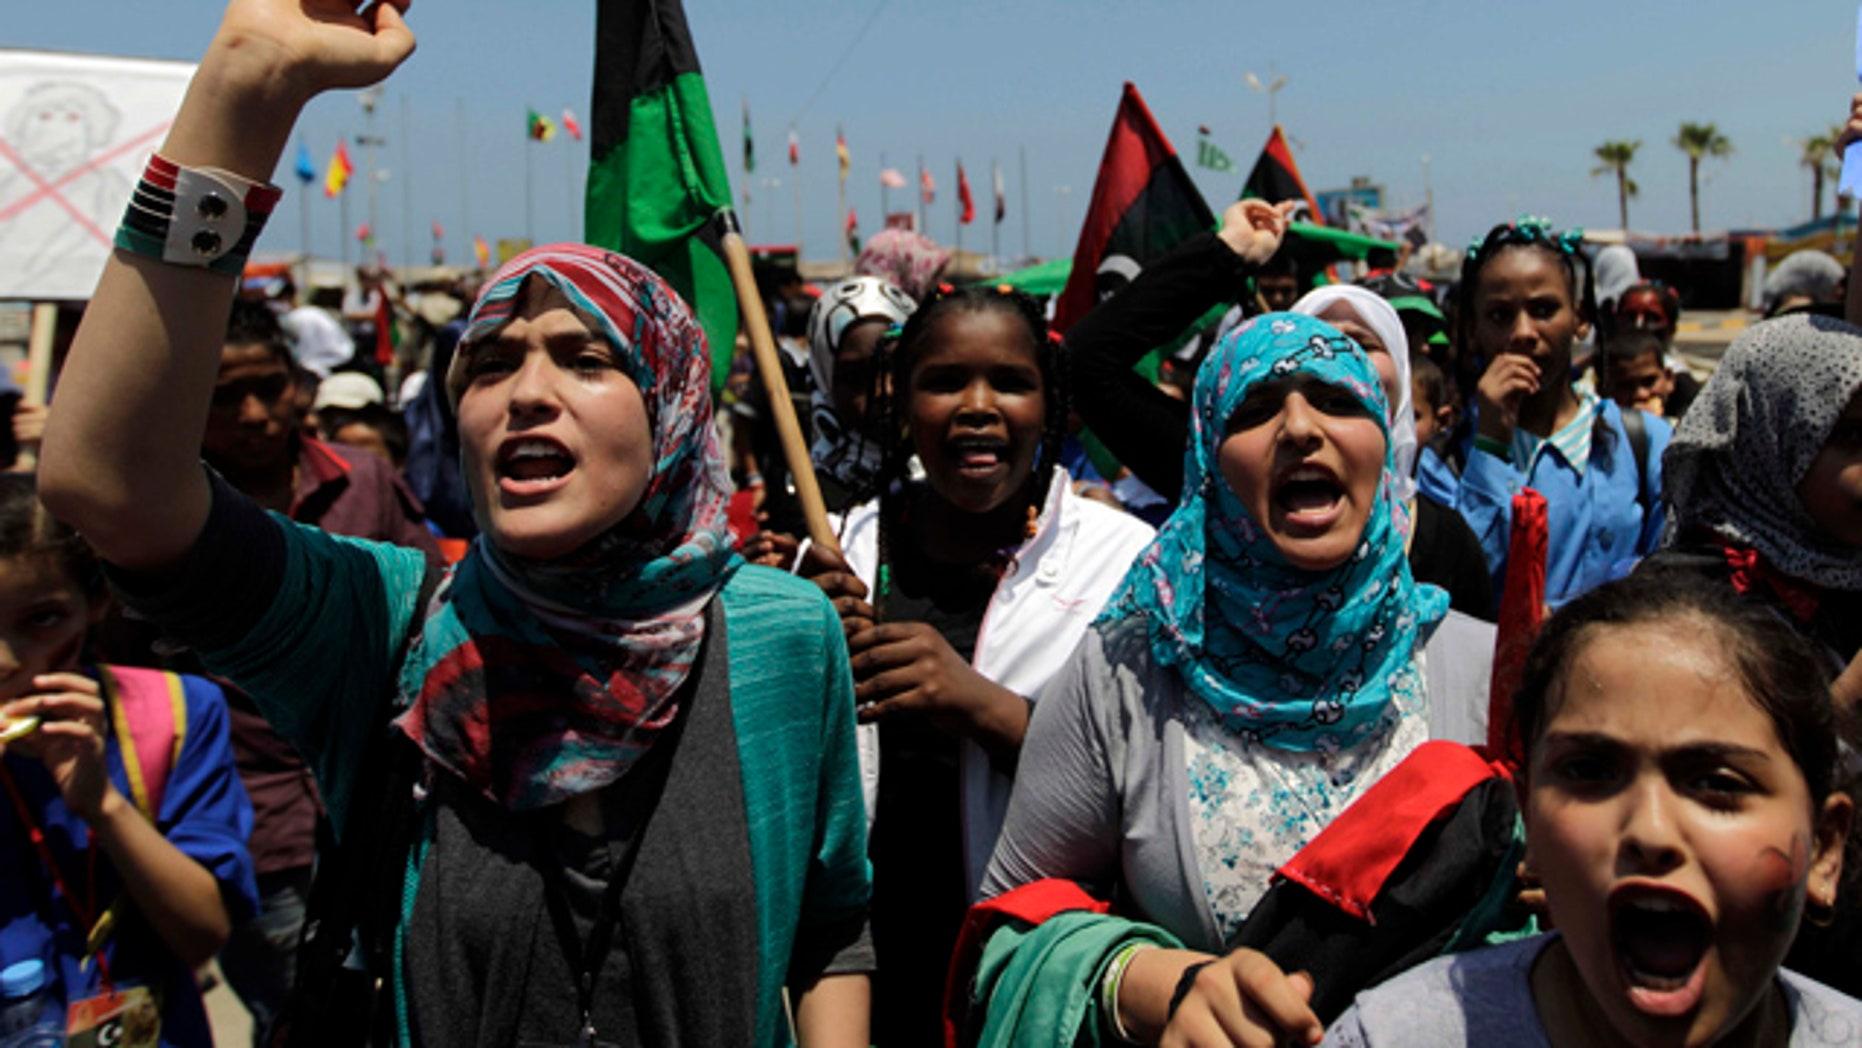 June 25: School students chant slogans against Muammar al-Qaddafi during a demonstration at the court square in the rebel-held capital Benghazi, Libya.